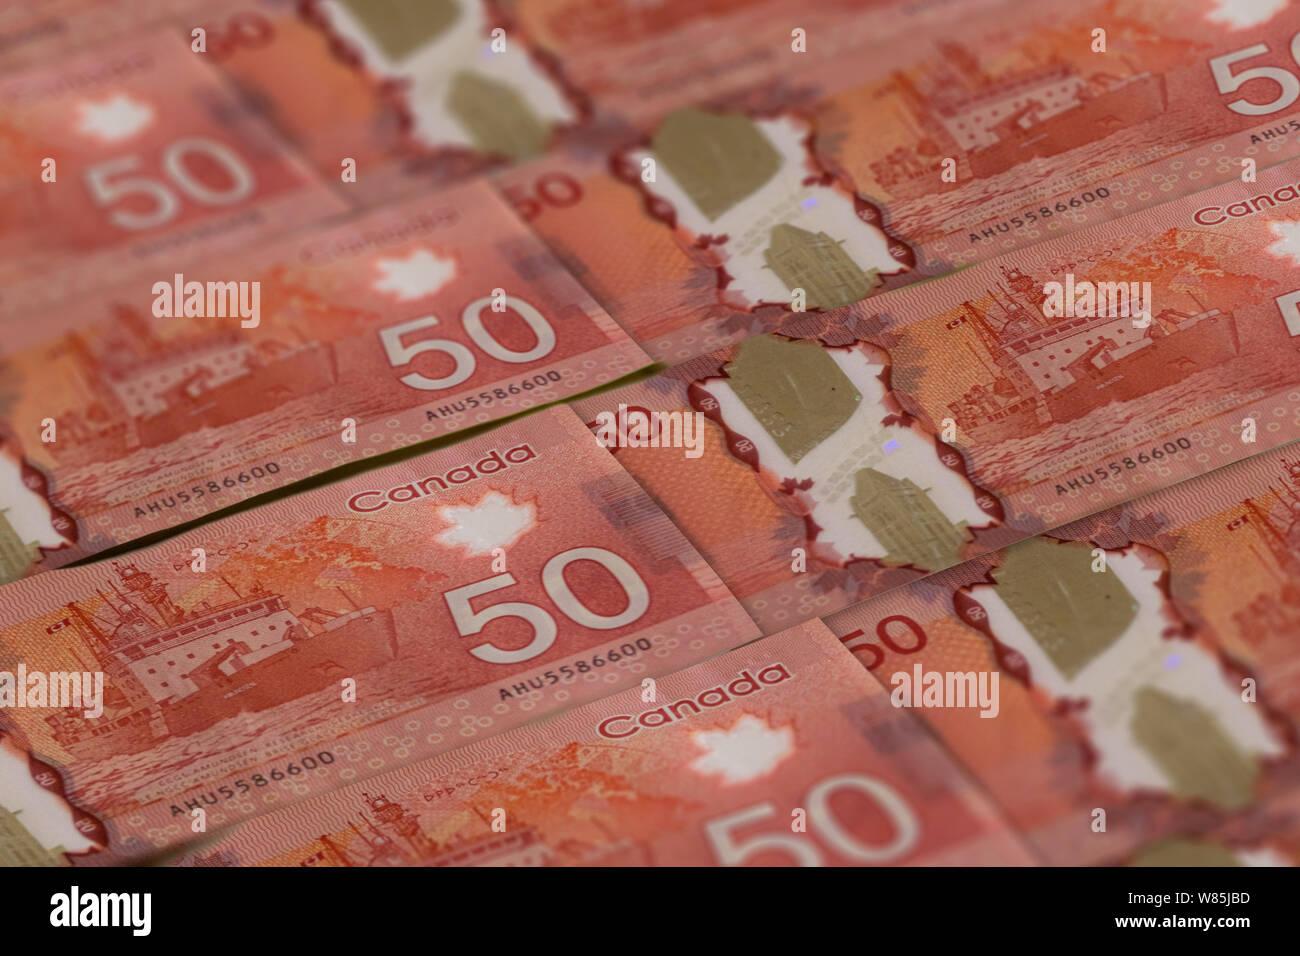 50 Dollars Stock Photos & 50 Dollars Stock Images - Alamy